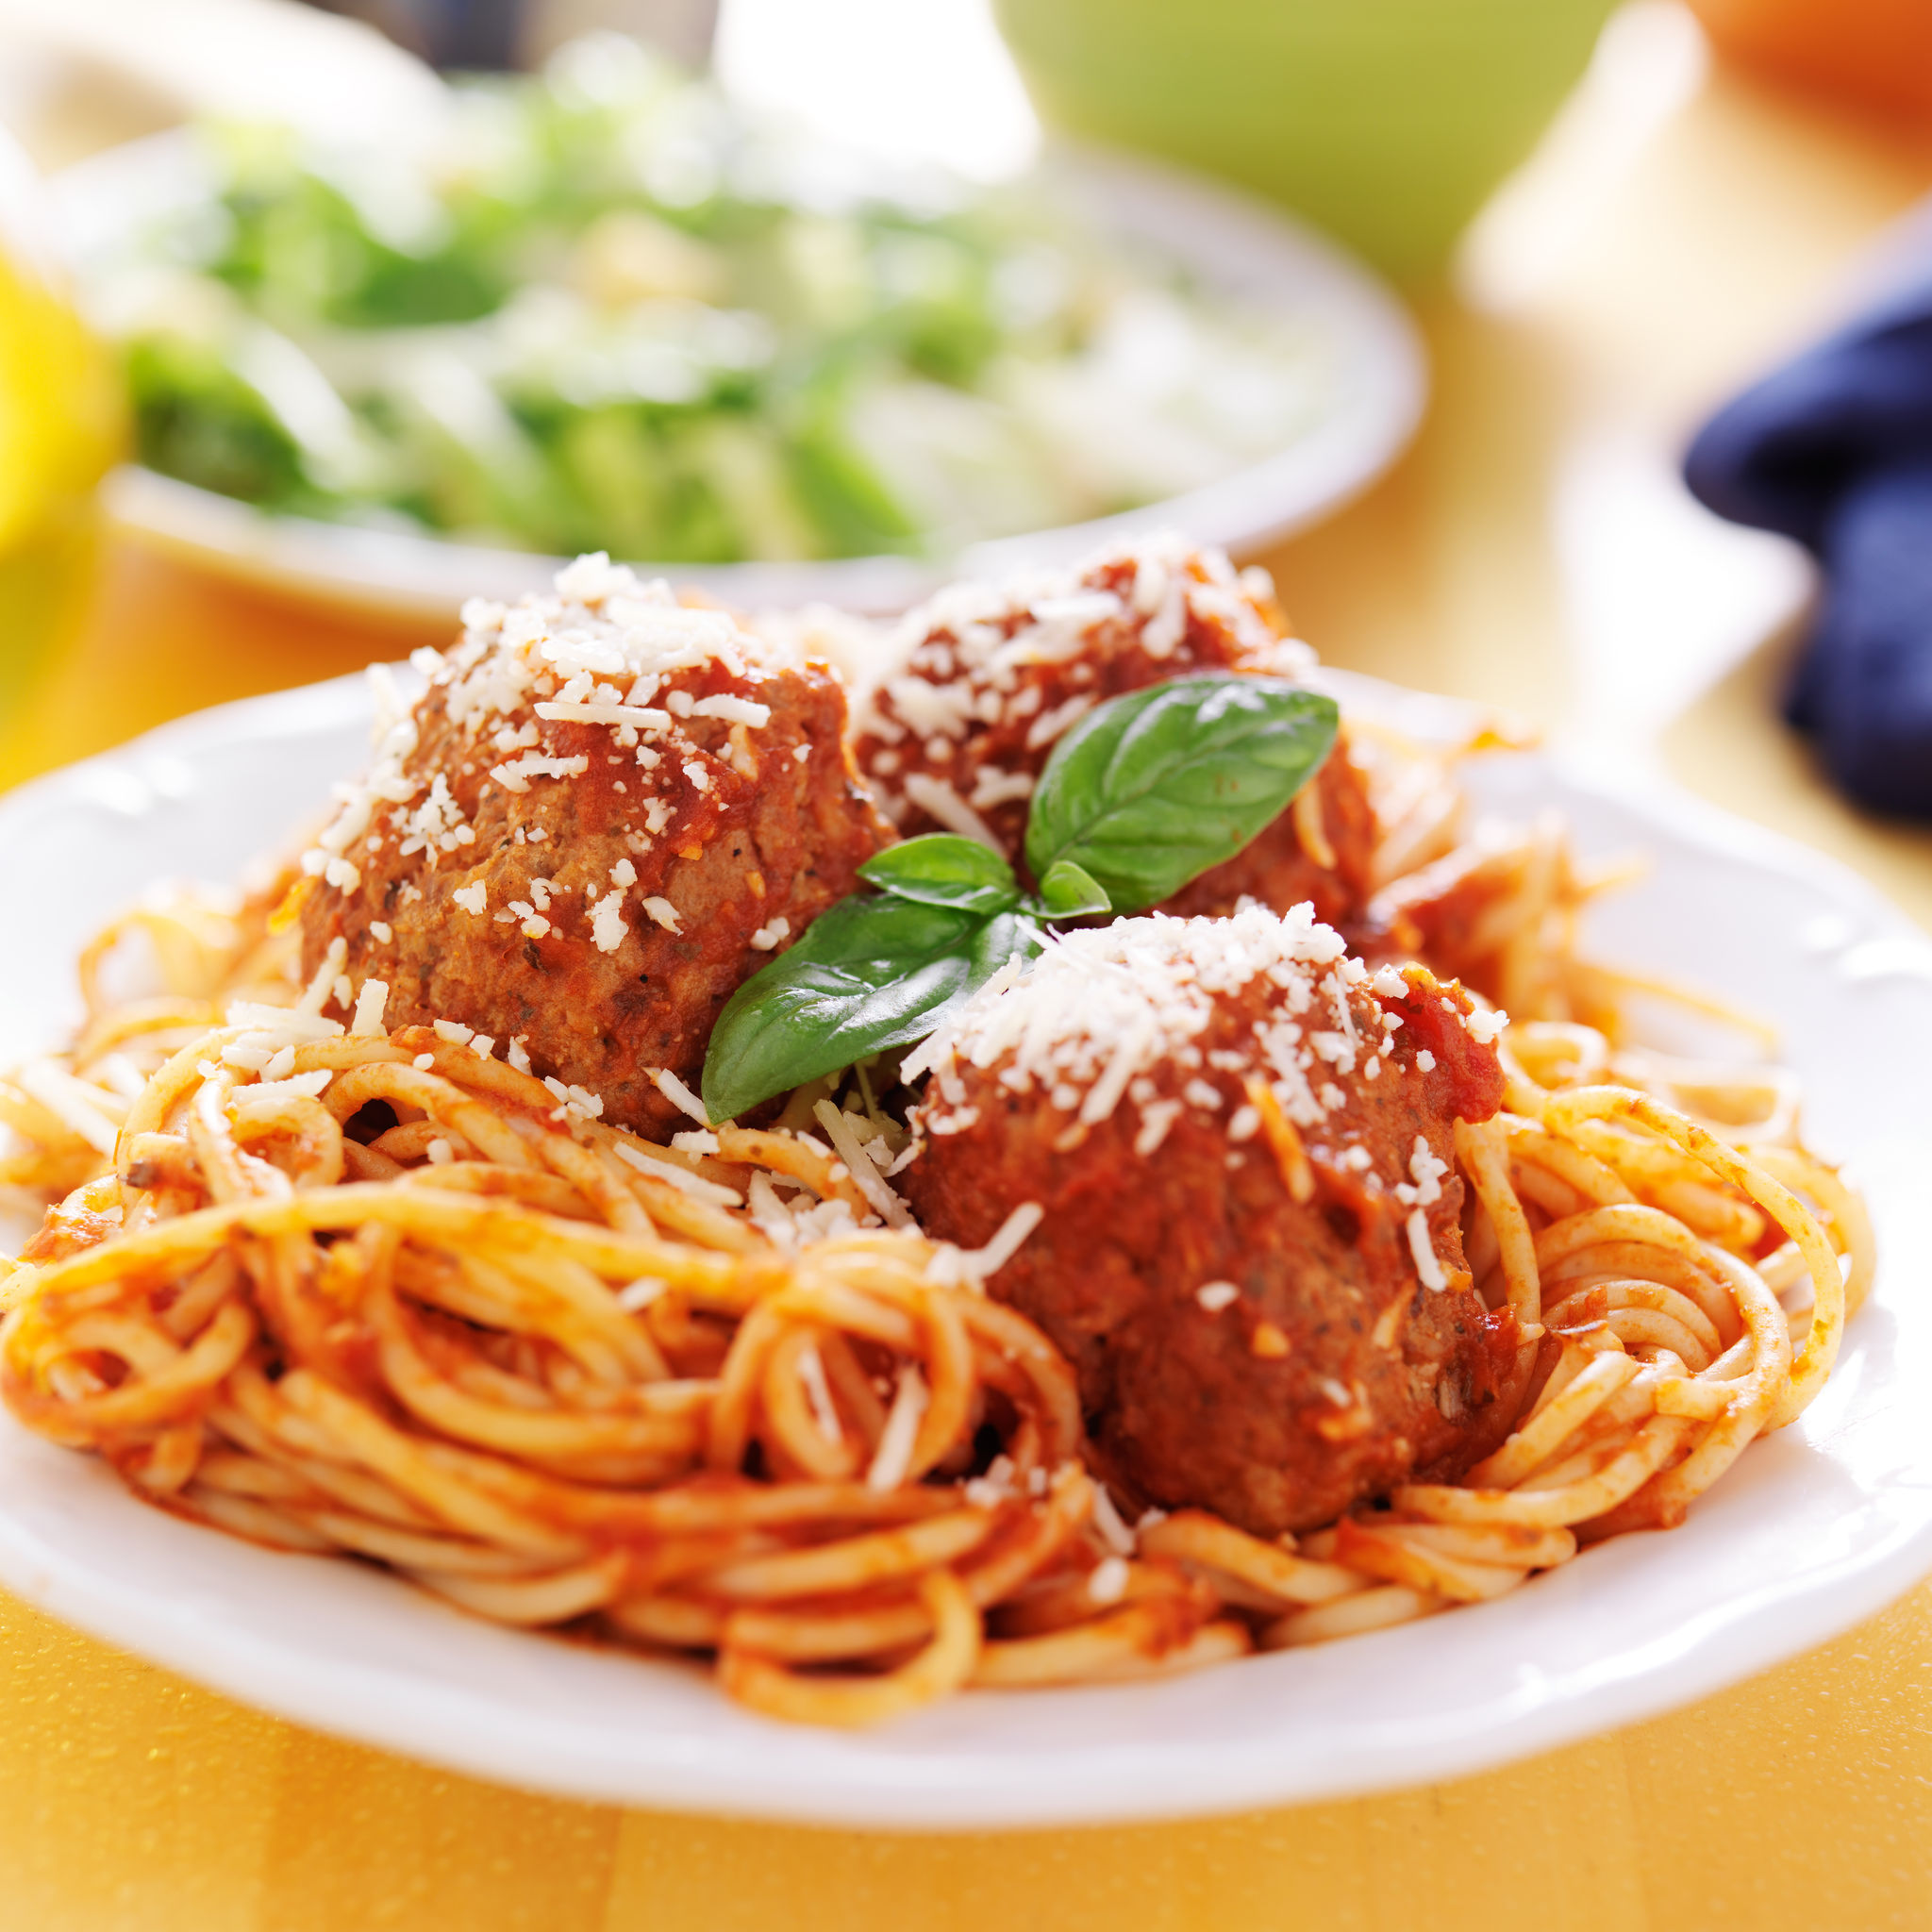 Simple Slow Cooker Recipe: Meatballs & Tomato Basil Sauce - 12 ...